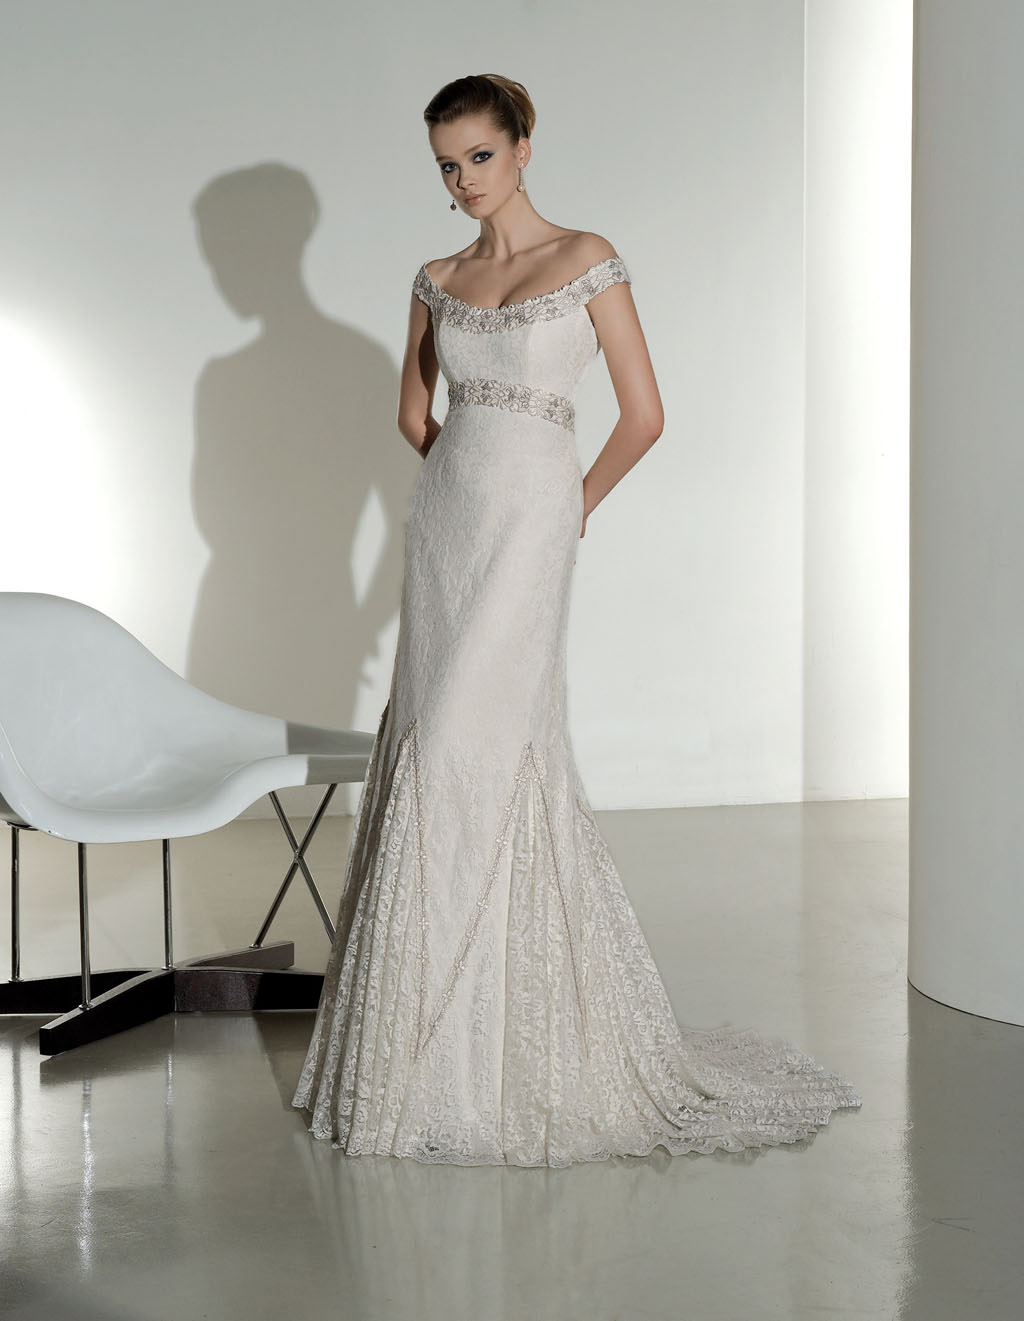 Vestidos de novia weight loss tips for wedding dresses 2 for Losing weight for wedding dress